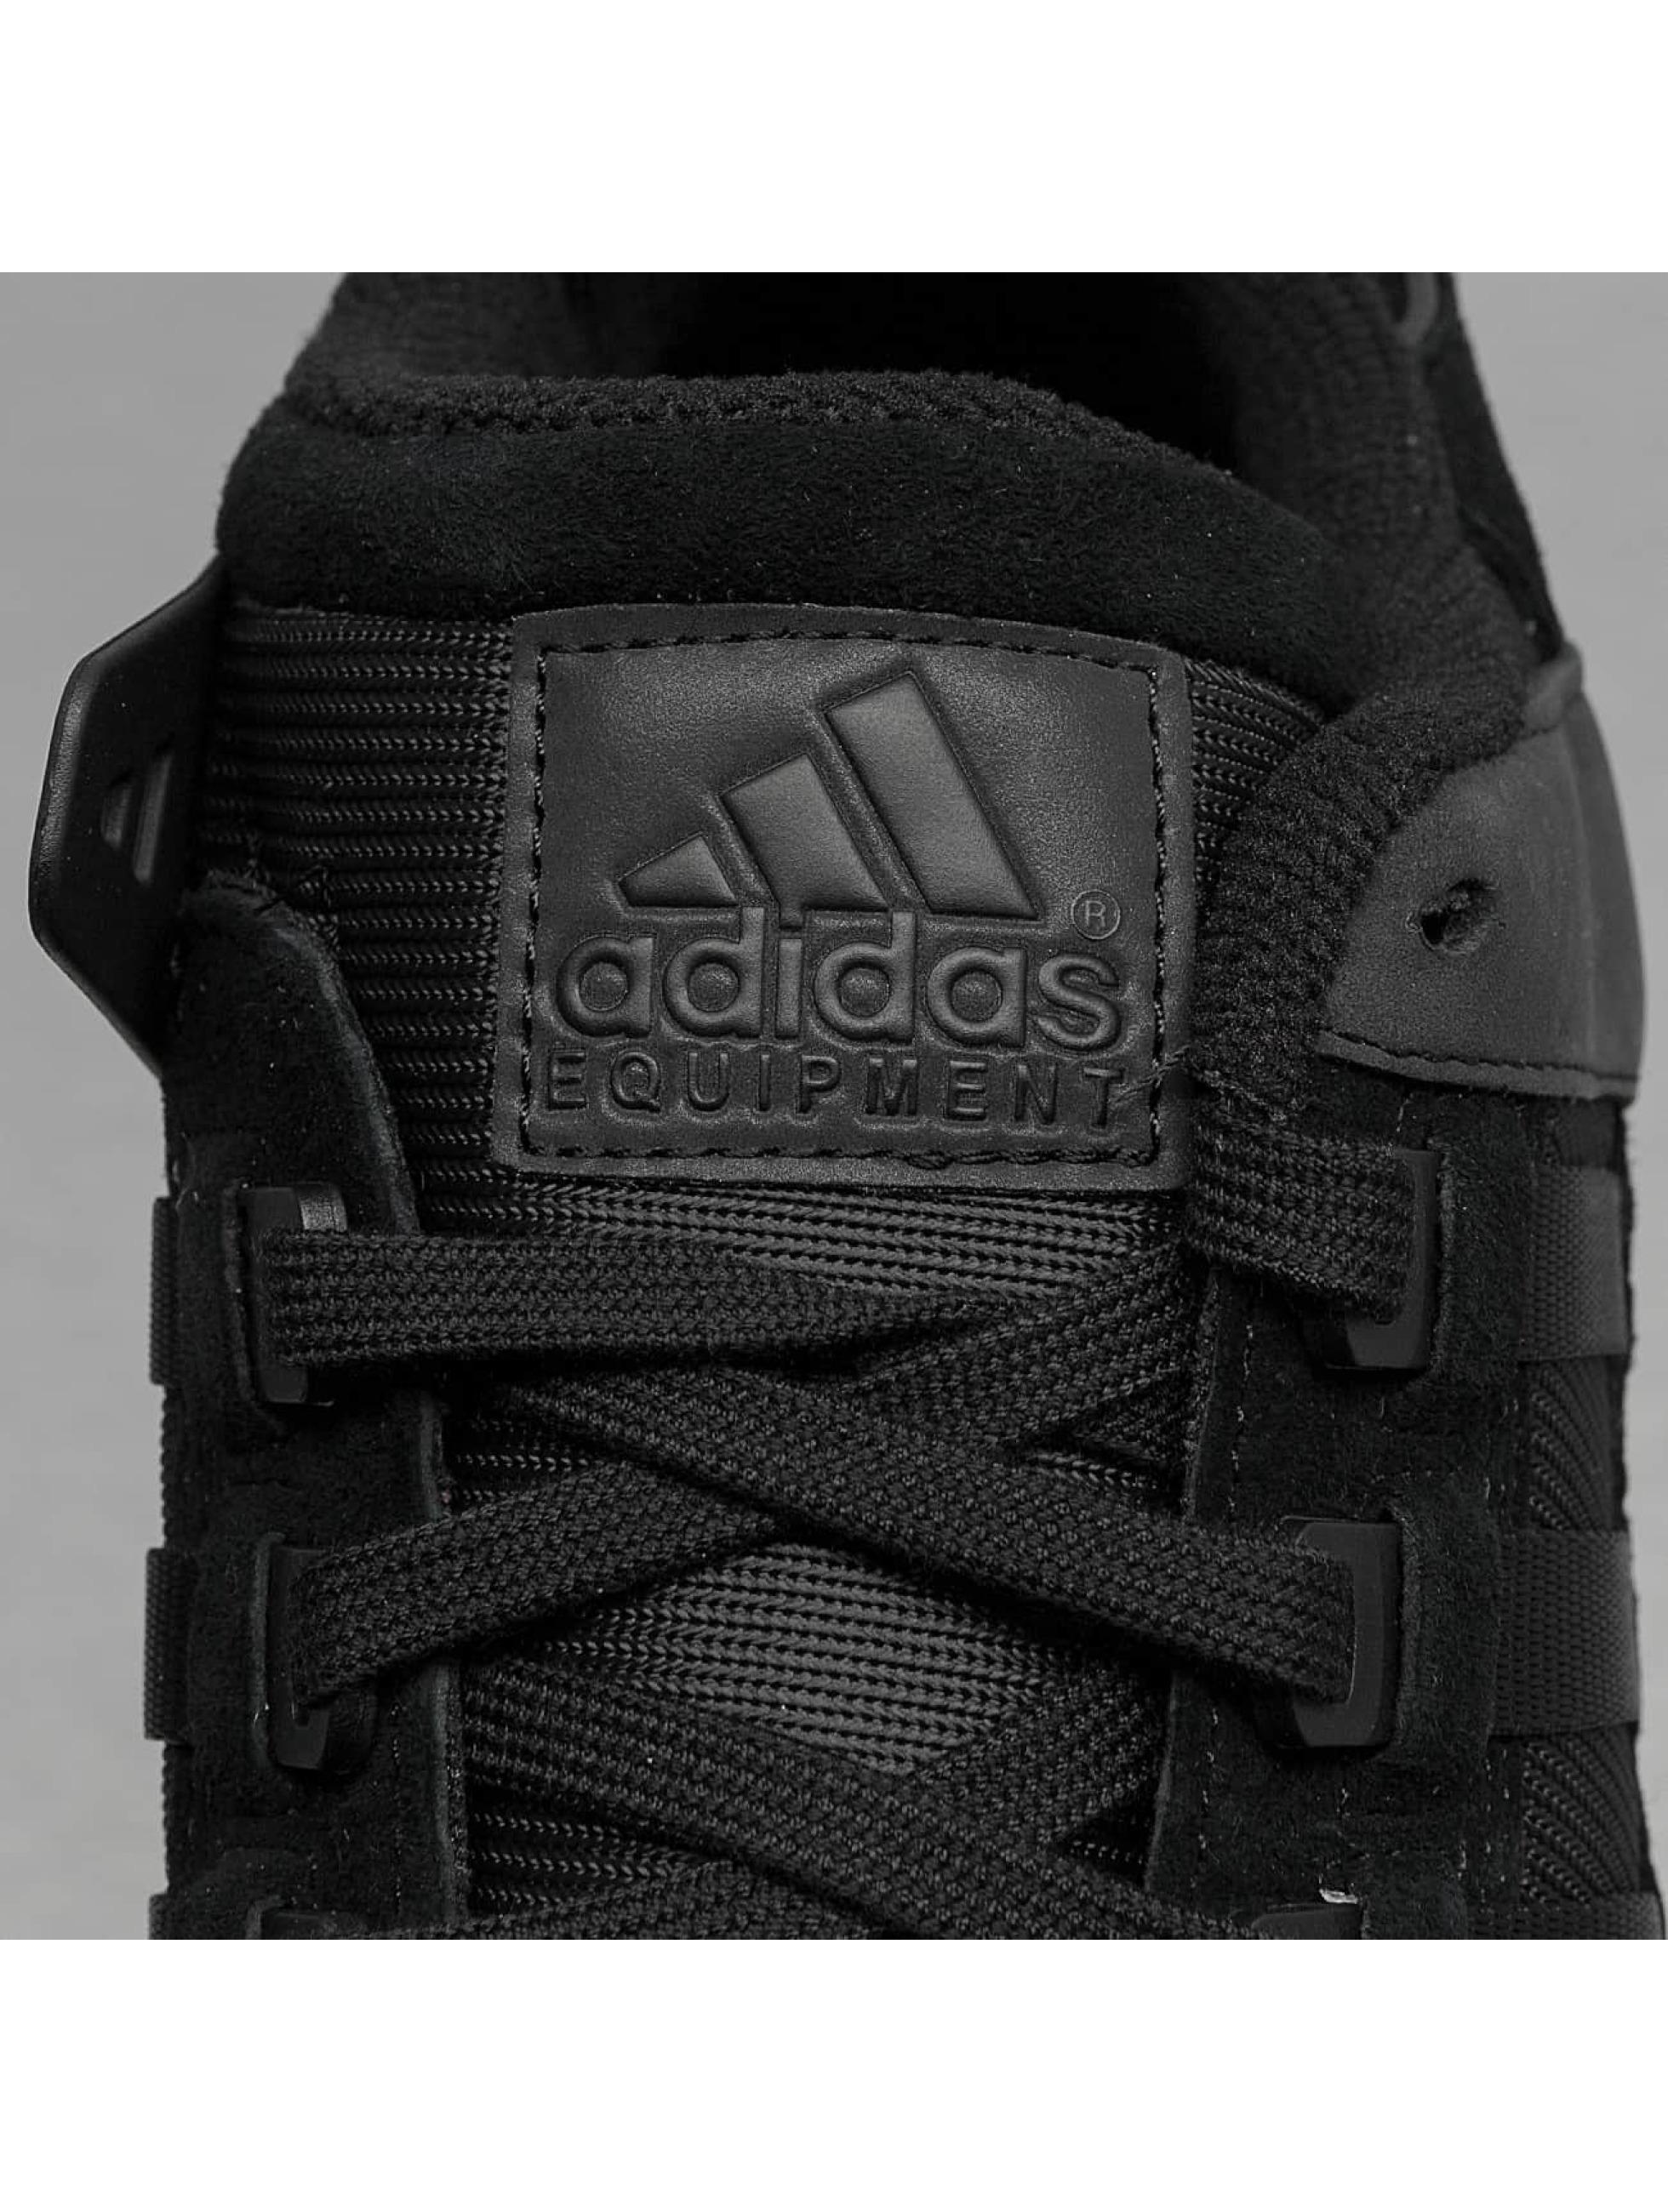 adidas Sneakers Equipment black